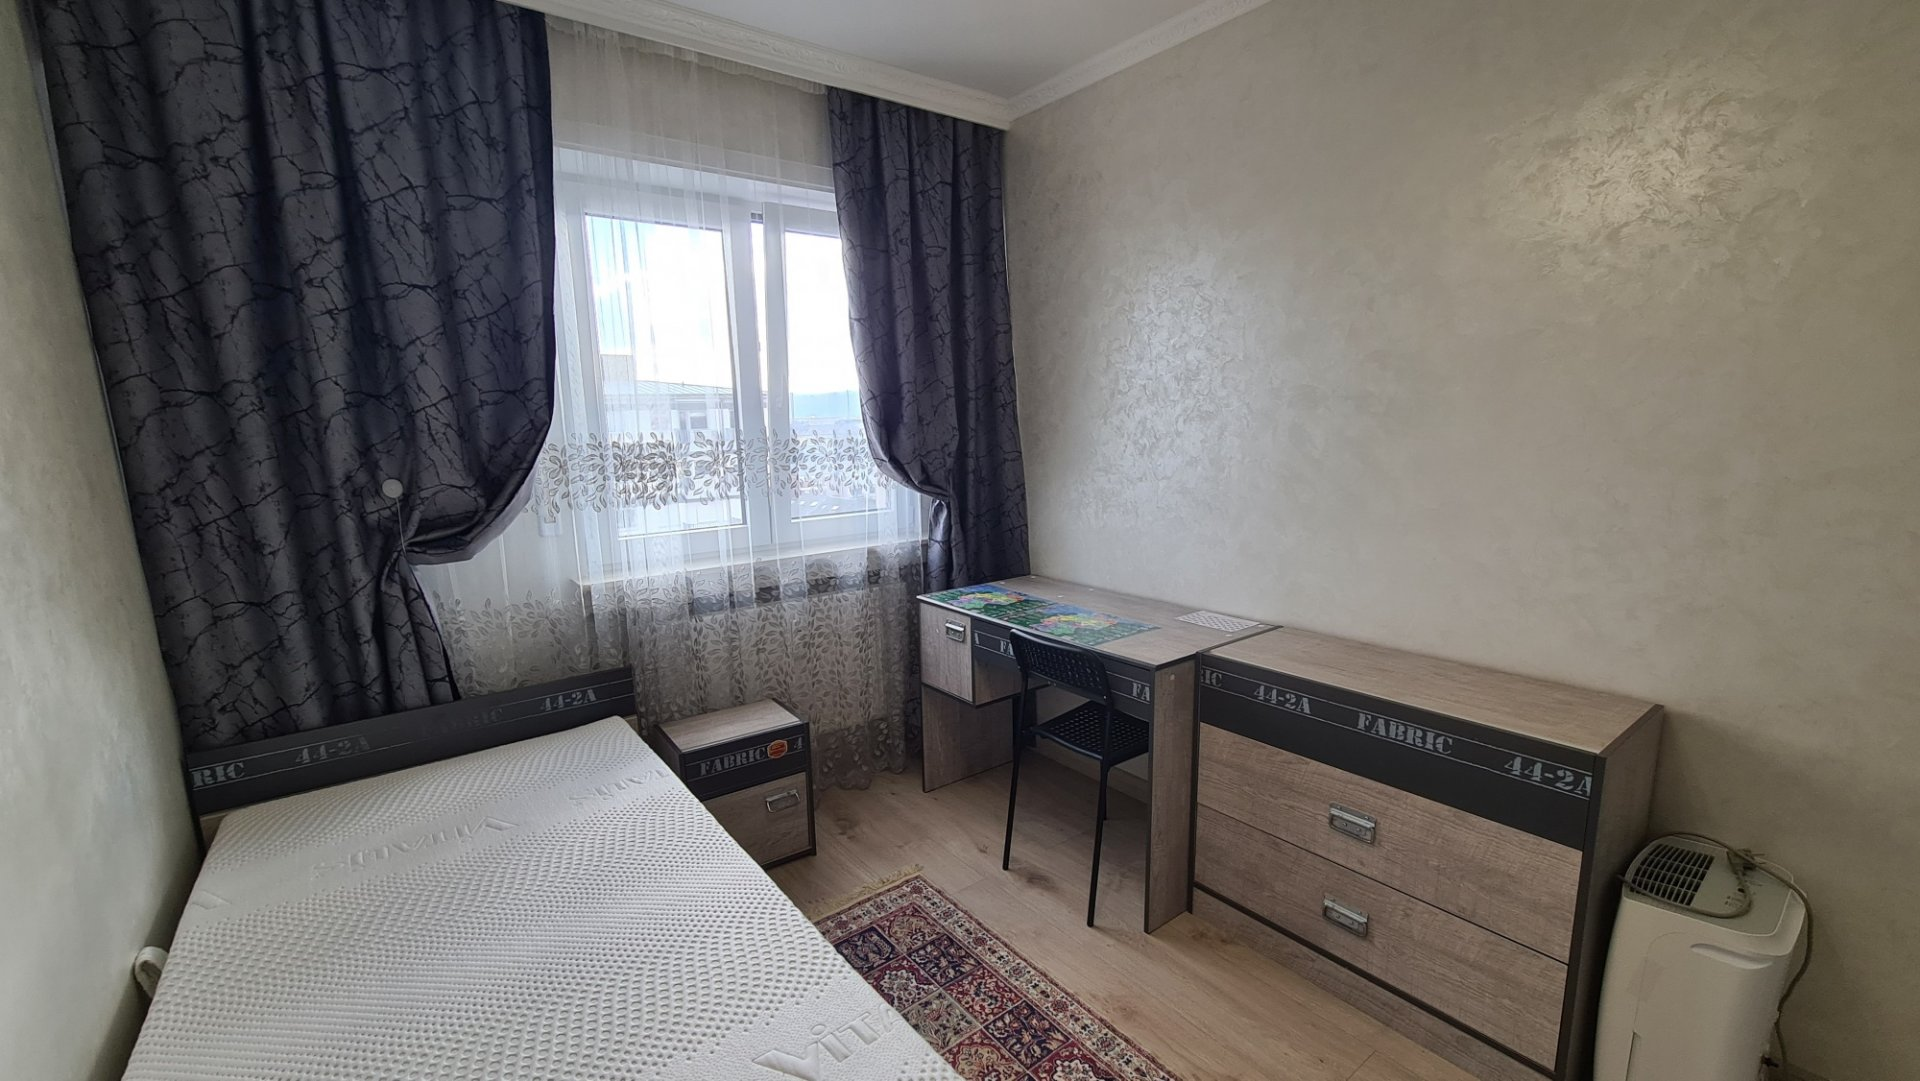 Rental Bedroom - Esch-sur-Alzette Lallange - Luxembourg